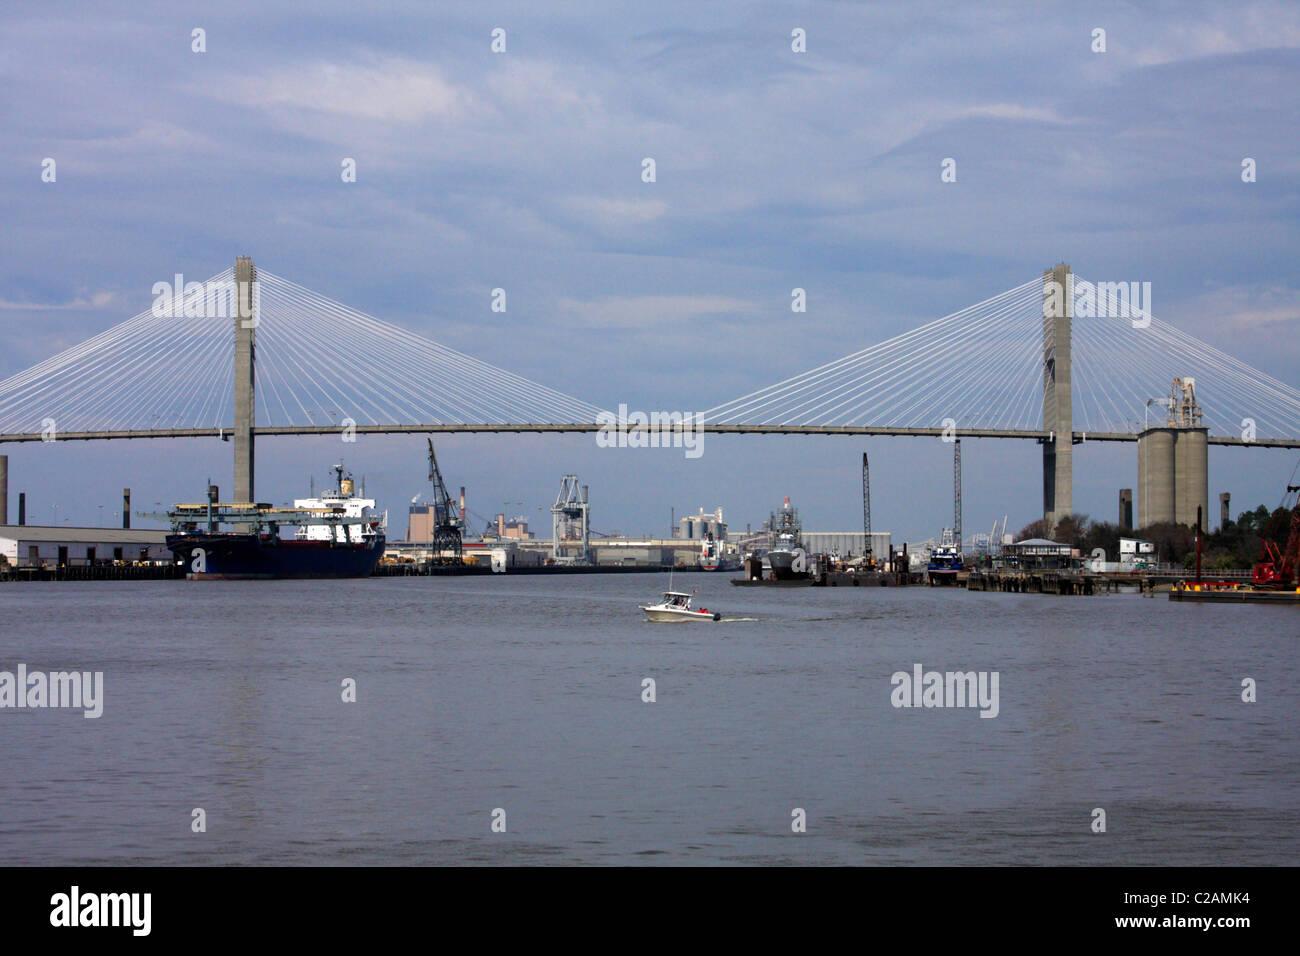 Talmadge Memorial Bridge, Savannah, Georgia, USA - Stock Image